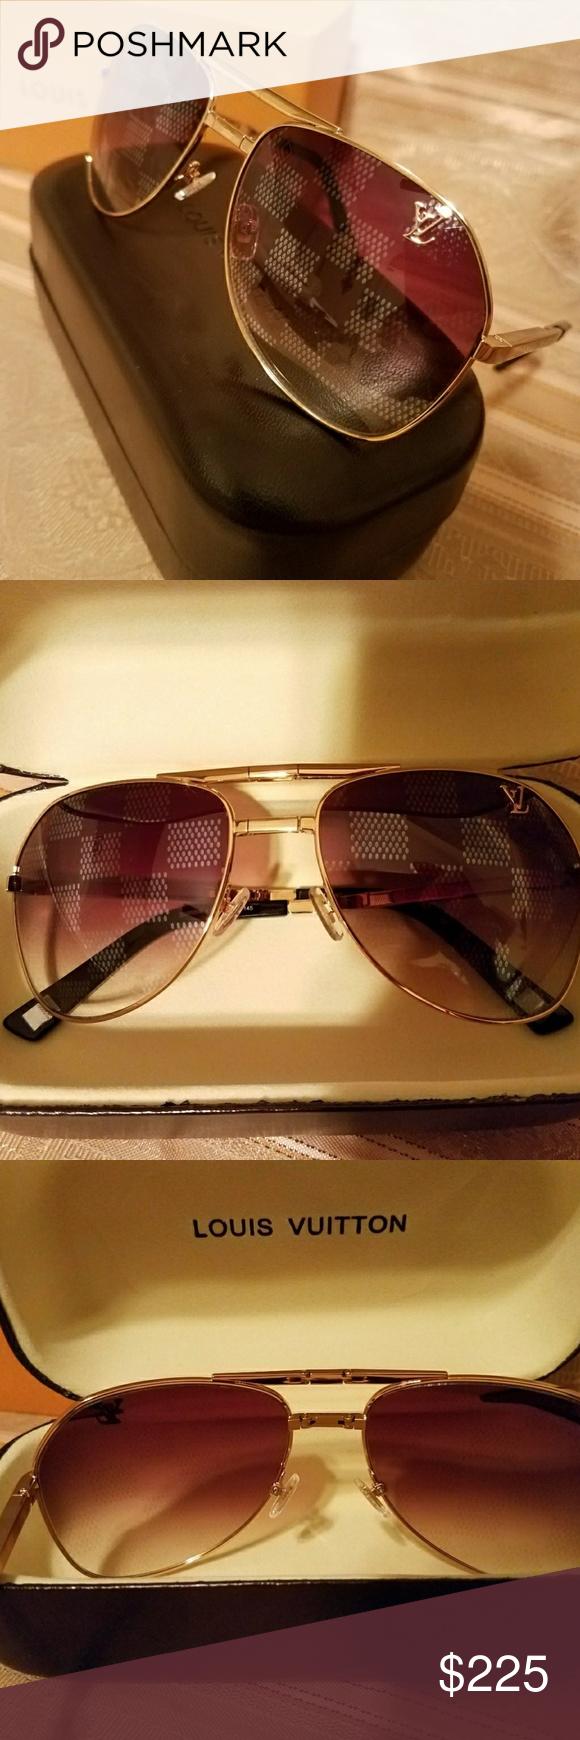 cc6a427debdf LOUIS VUITTON ATTITUDE PILOT Sunglasses AUTHENTIC LV ATTITUDE PILOT  Sunglasses NEW INCLUDES CASE BOX MICROFIBER CLOTH Louis Vuitton Accessories  Glasses